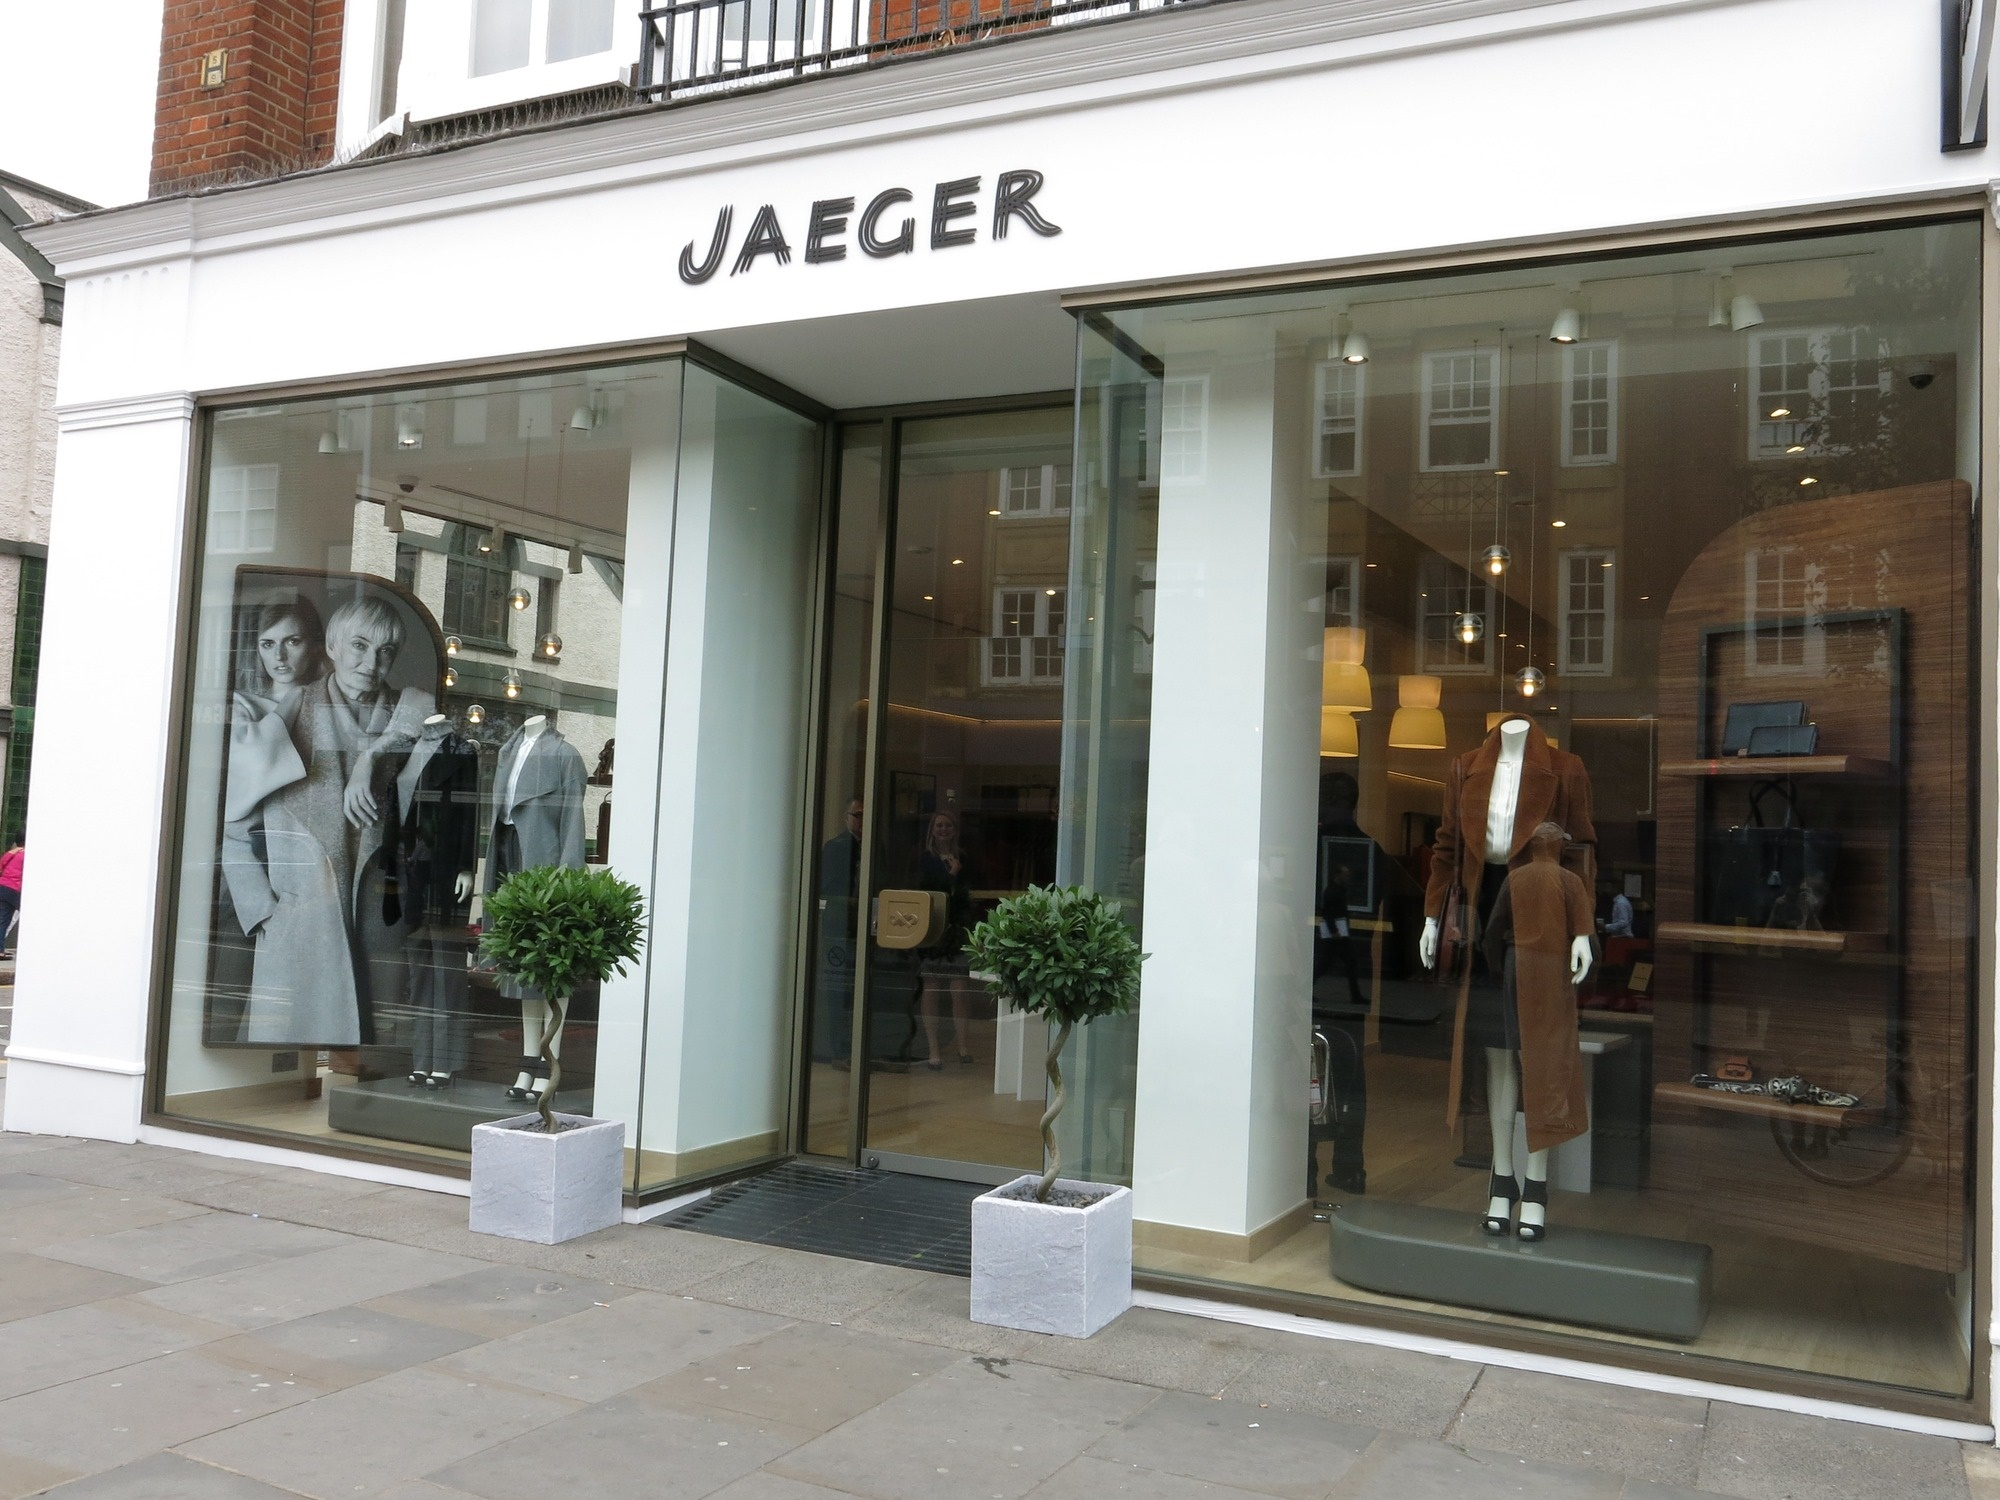 Jaeger.jpg